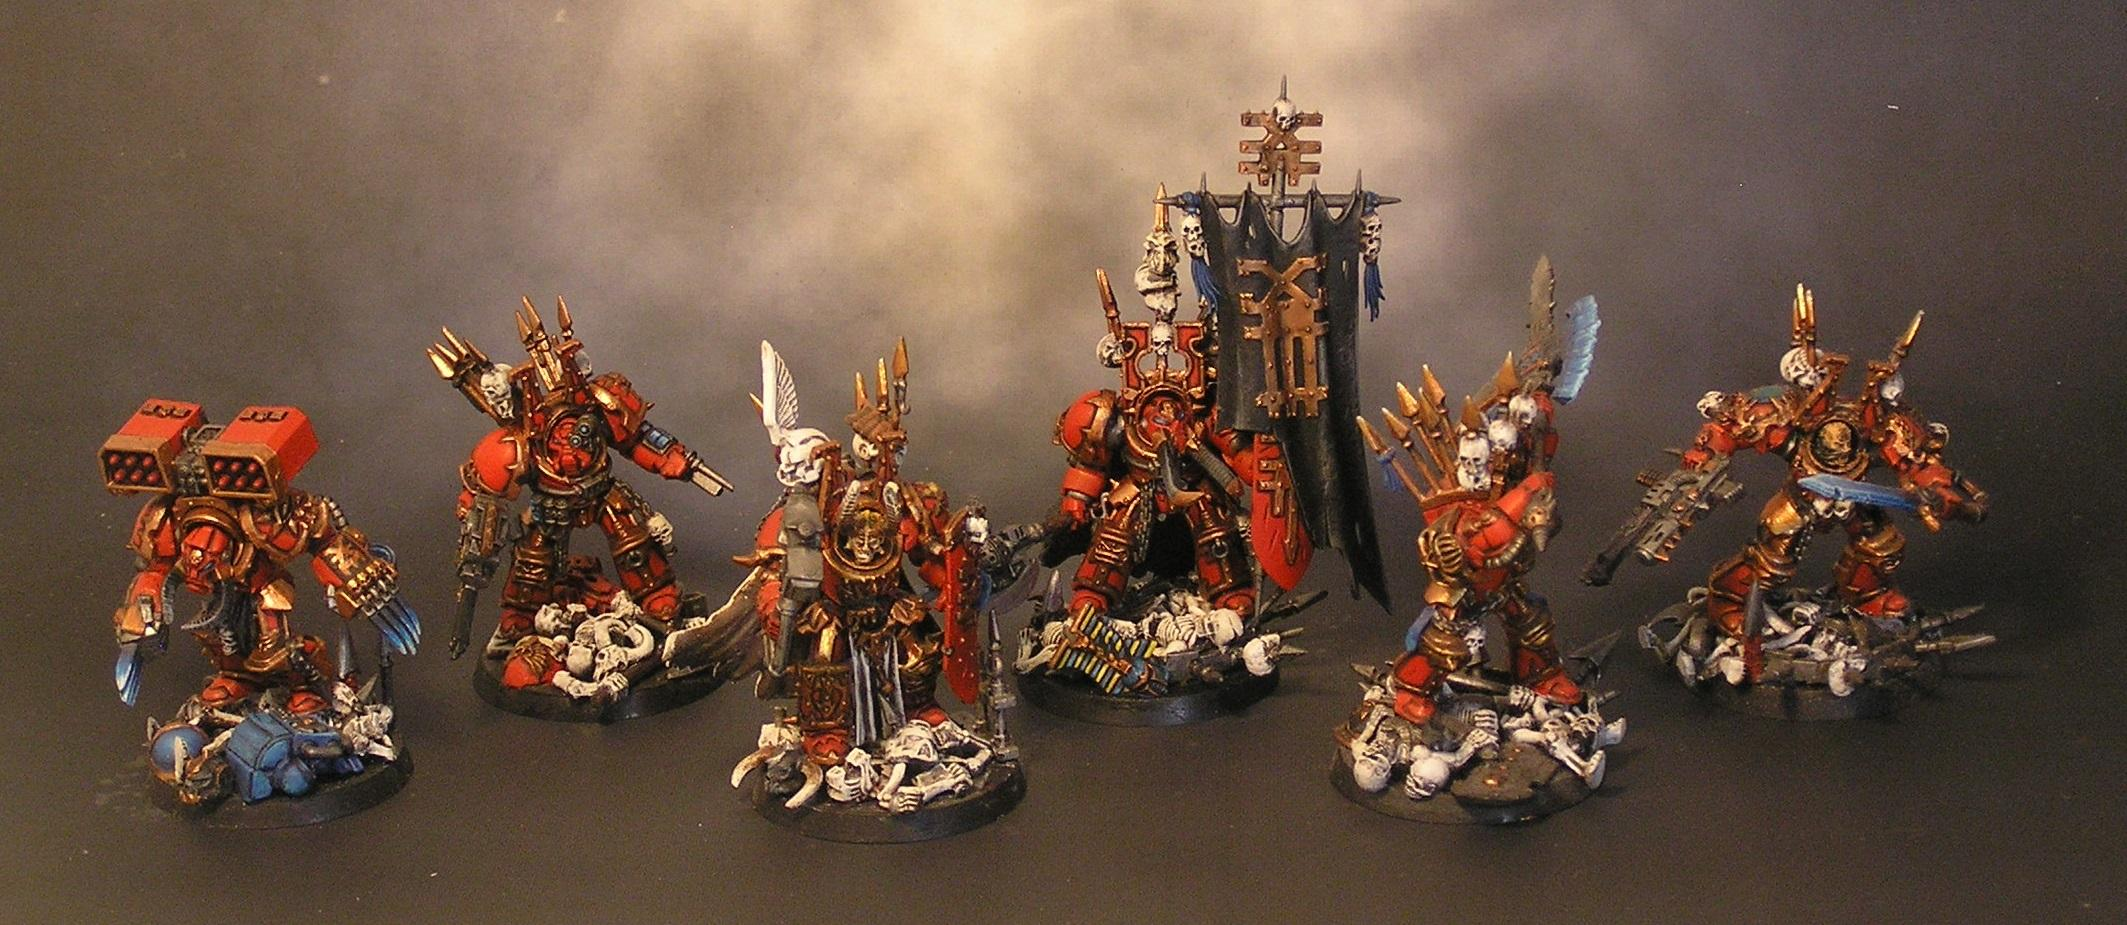 Banner, Chaos Space Marines, Khorne, Khorne Berserkers, Lightning Claws, Standard Bearer, Terminator Armor, Warhammer 40,000